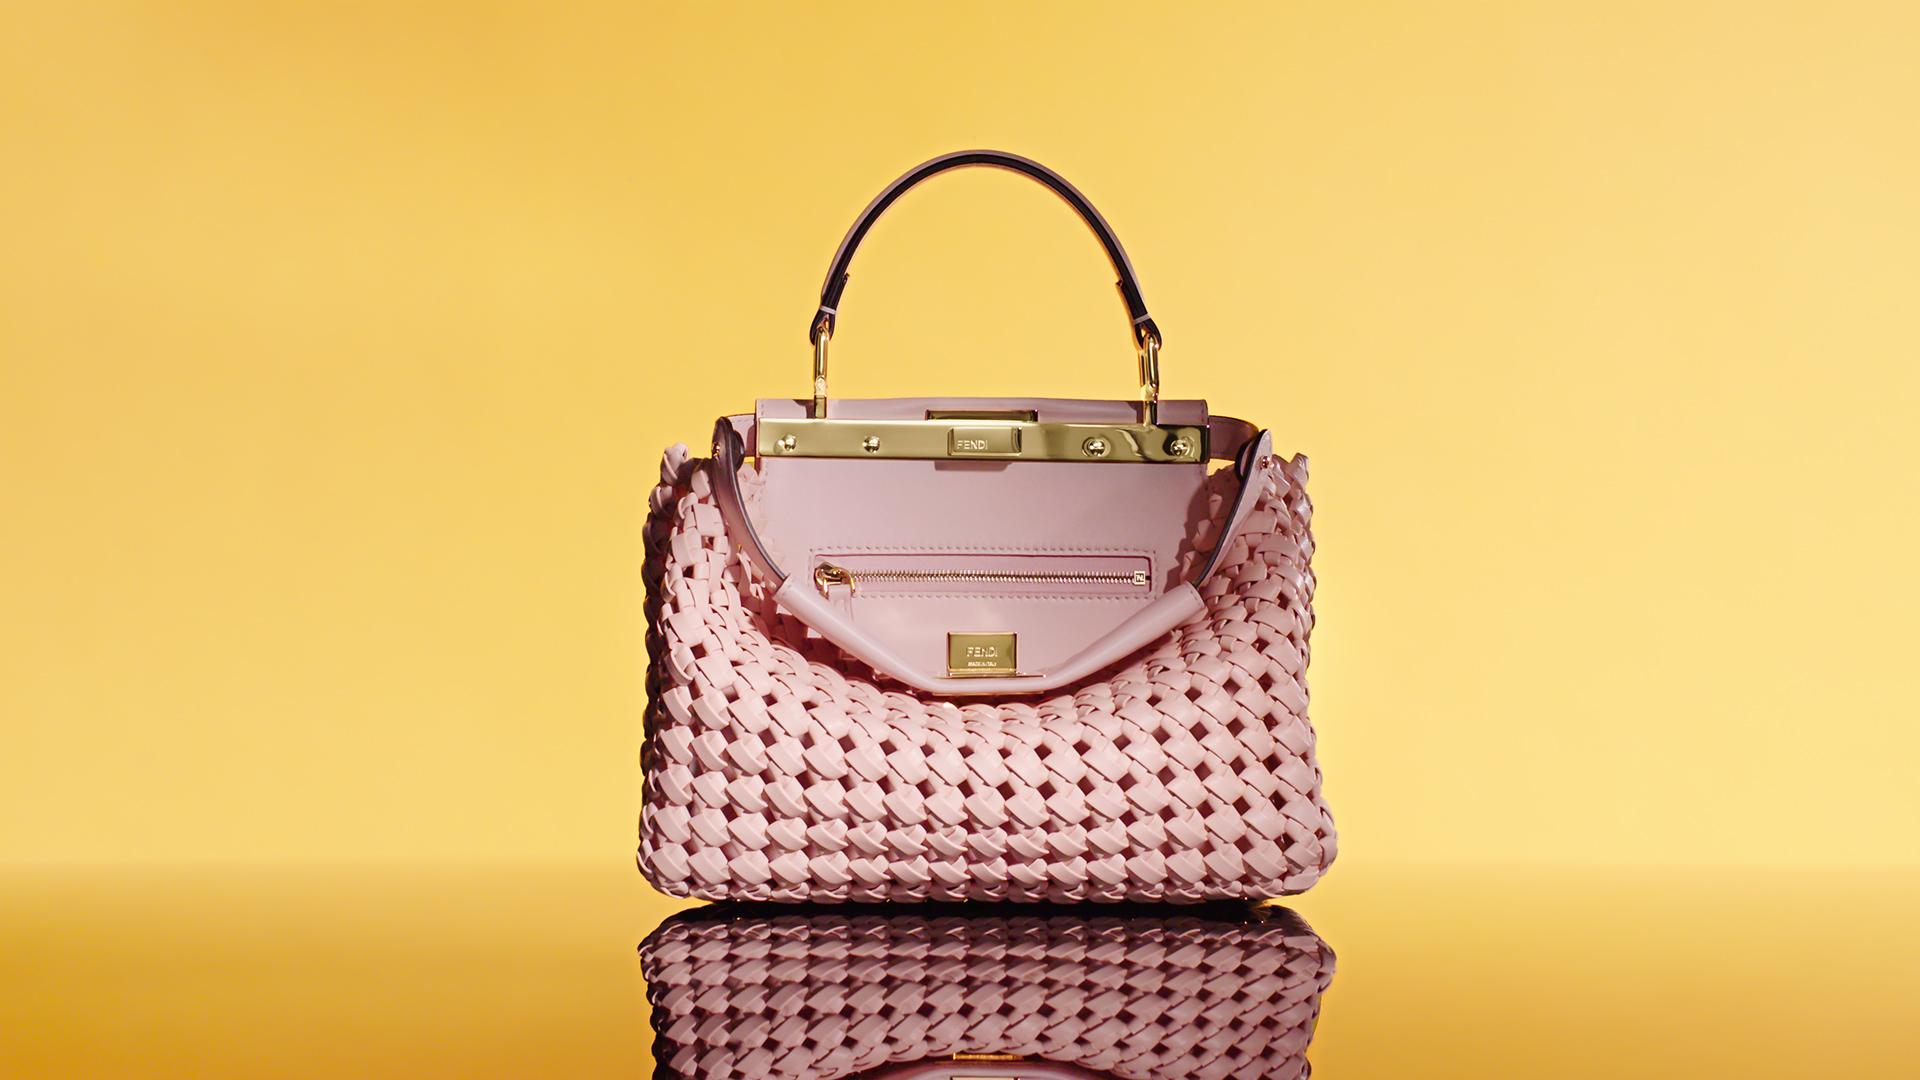 Fendi Peekaboo Handbag Savoir Faire Spring 2020 Ad Campaign Photos